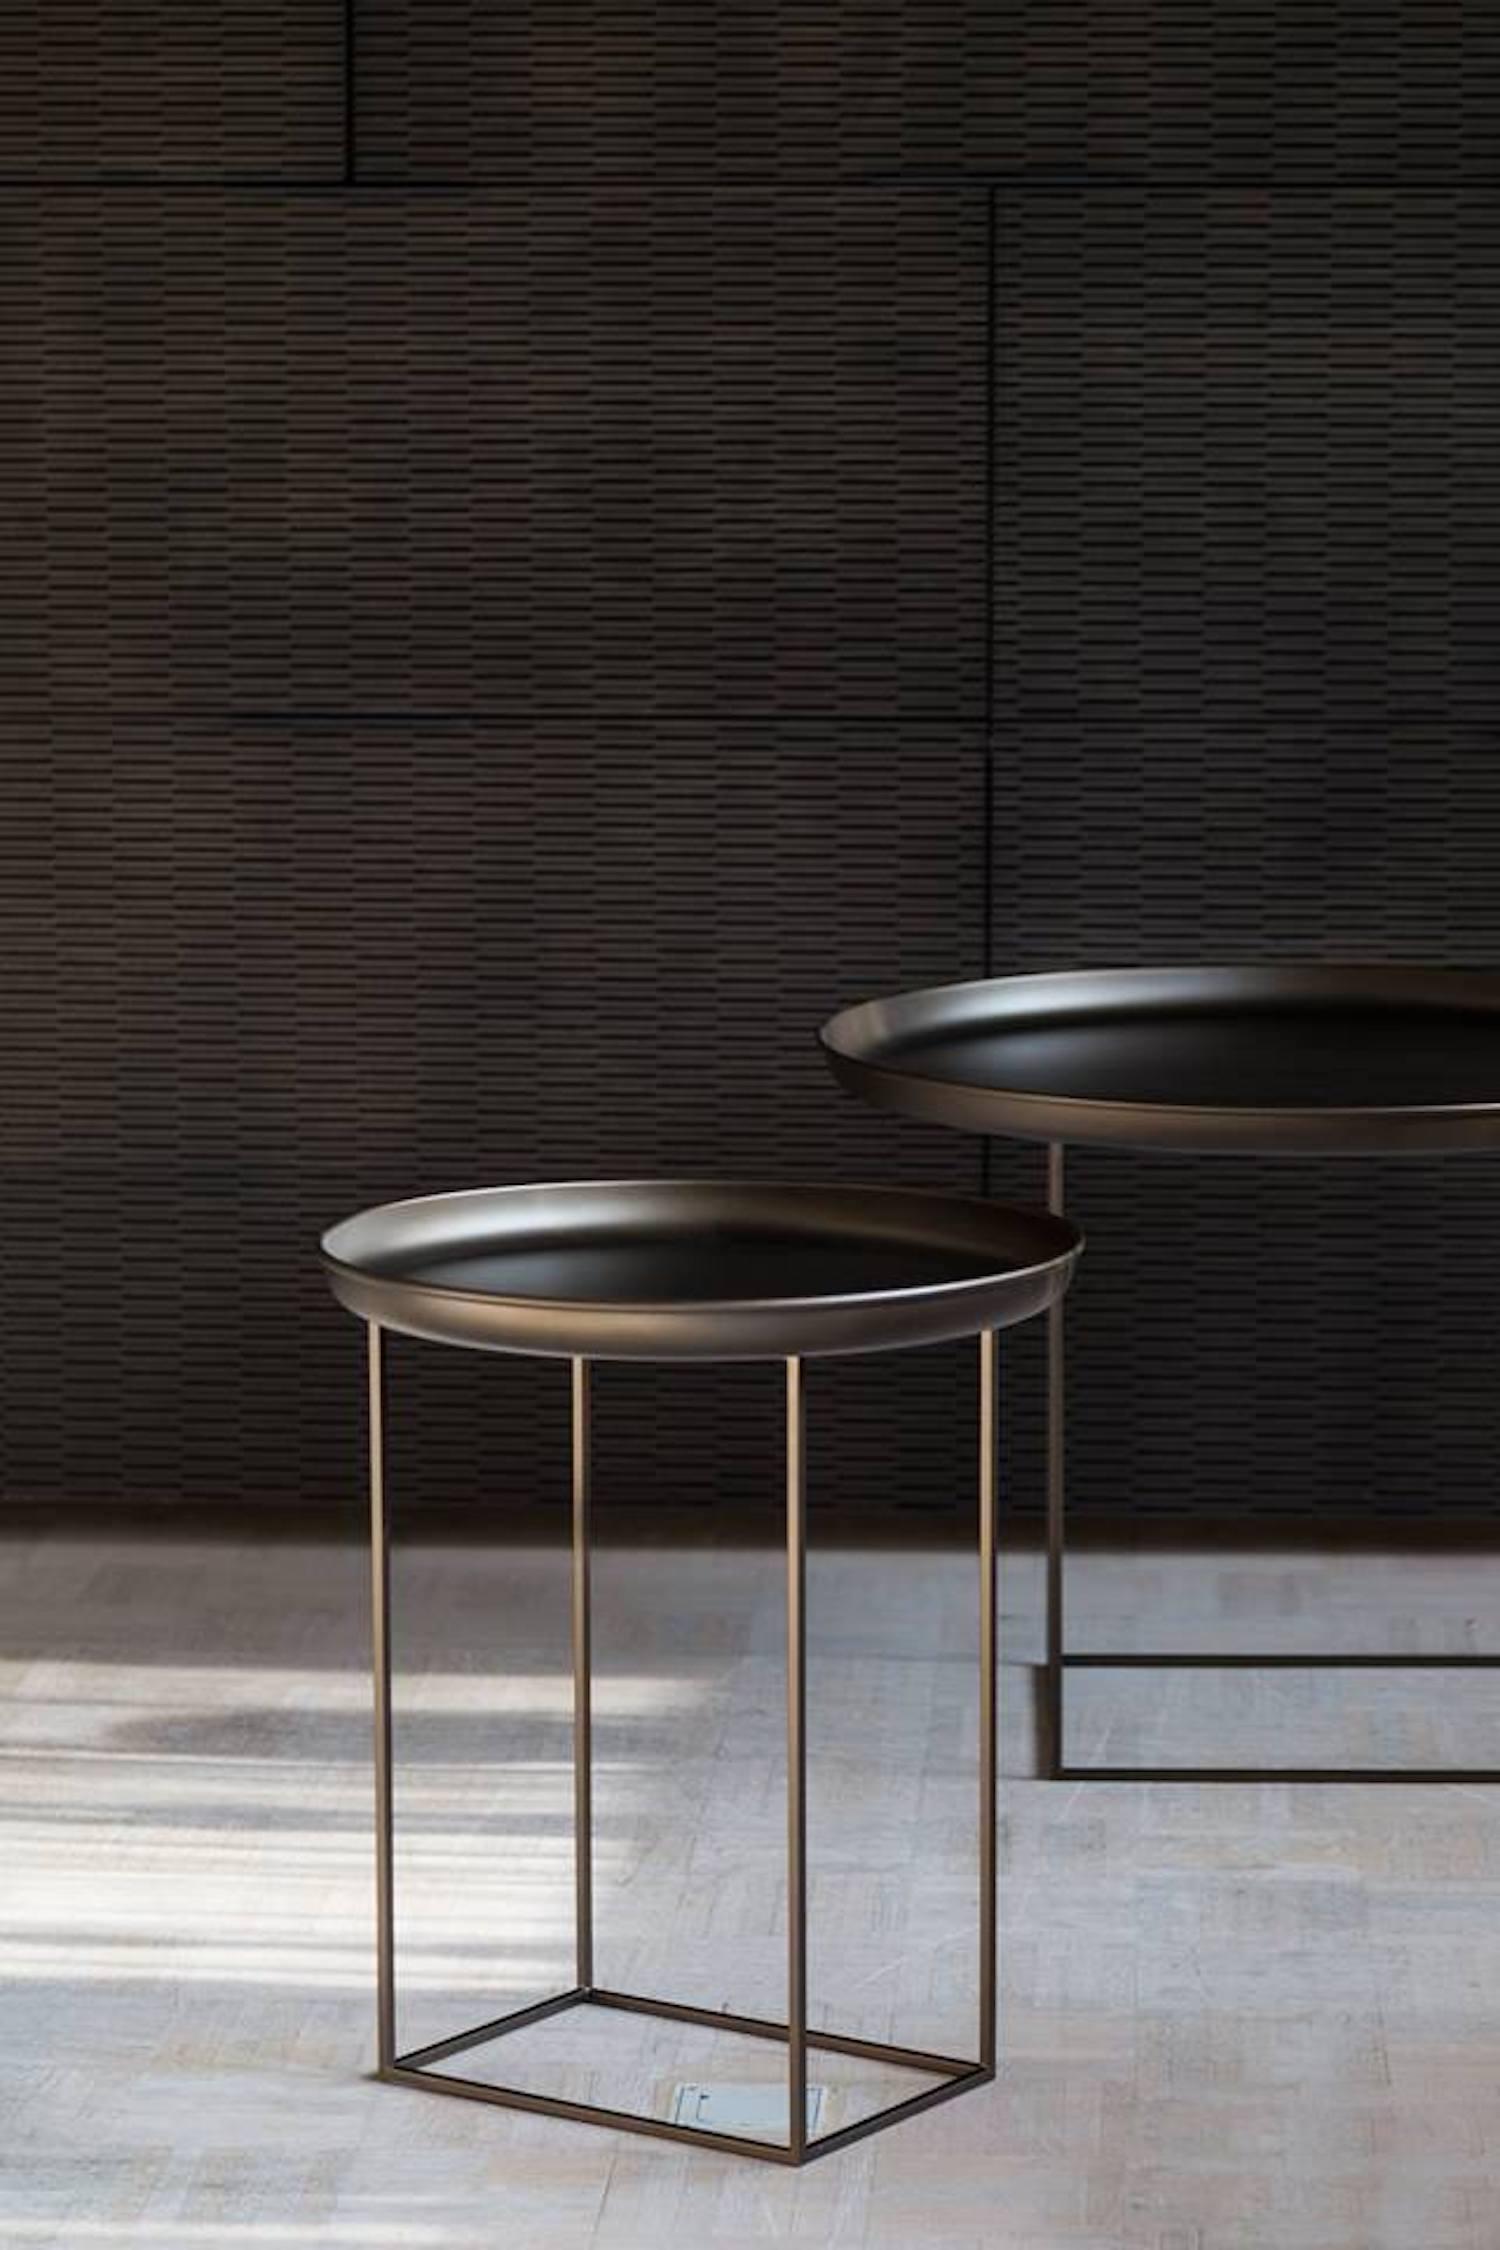 Duke tafels -